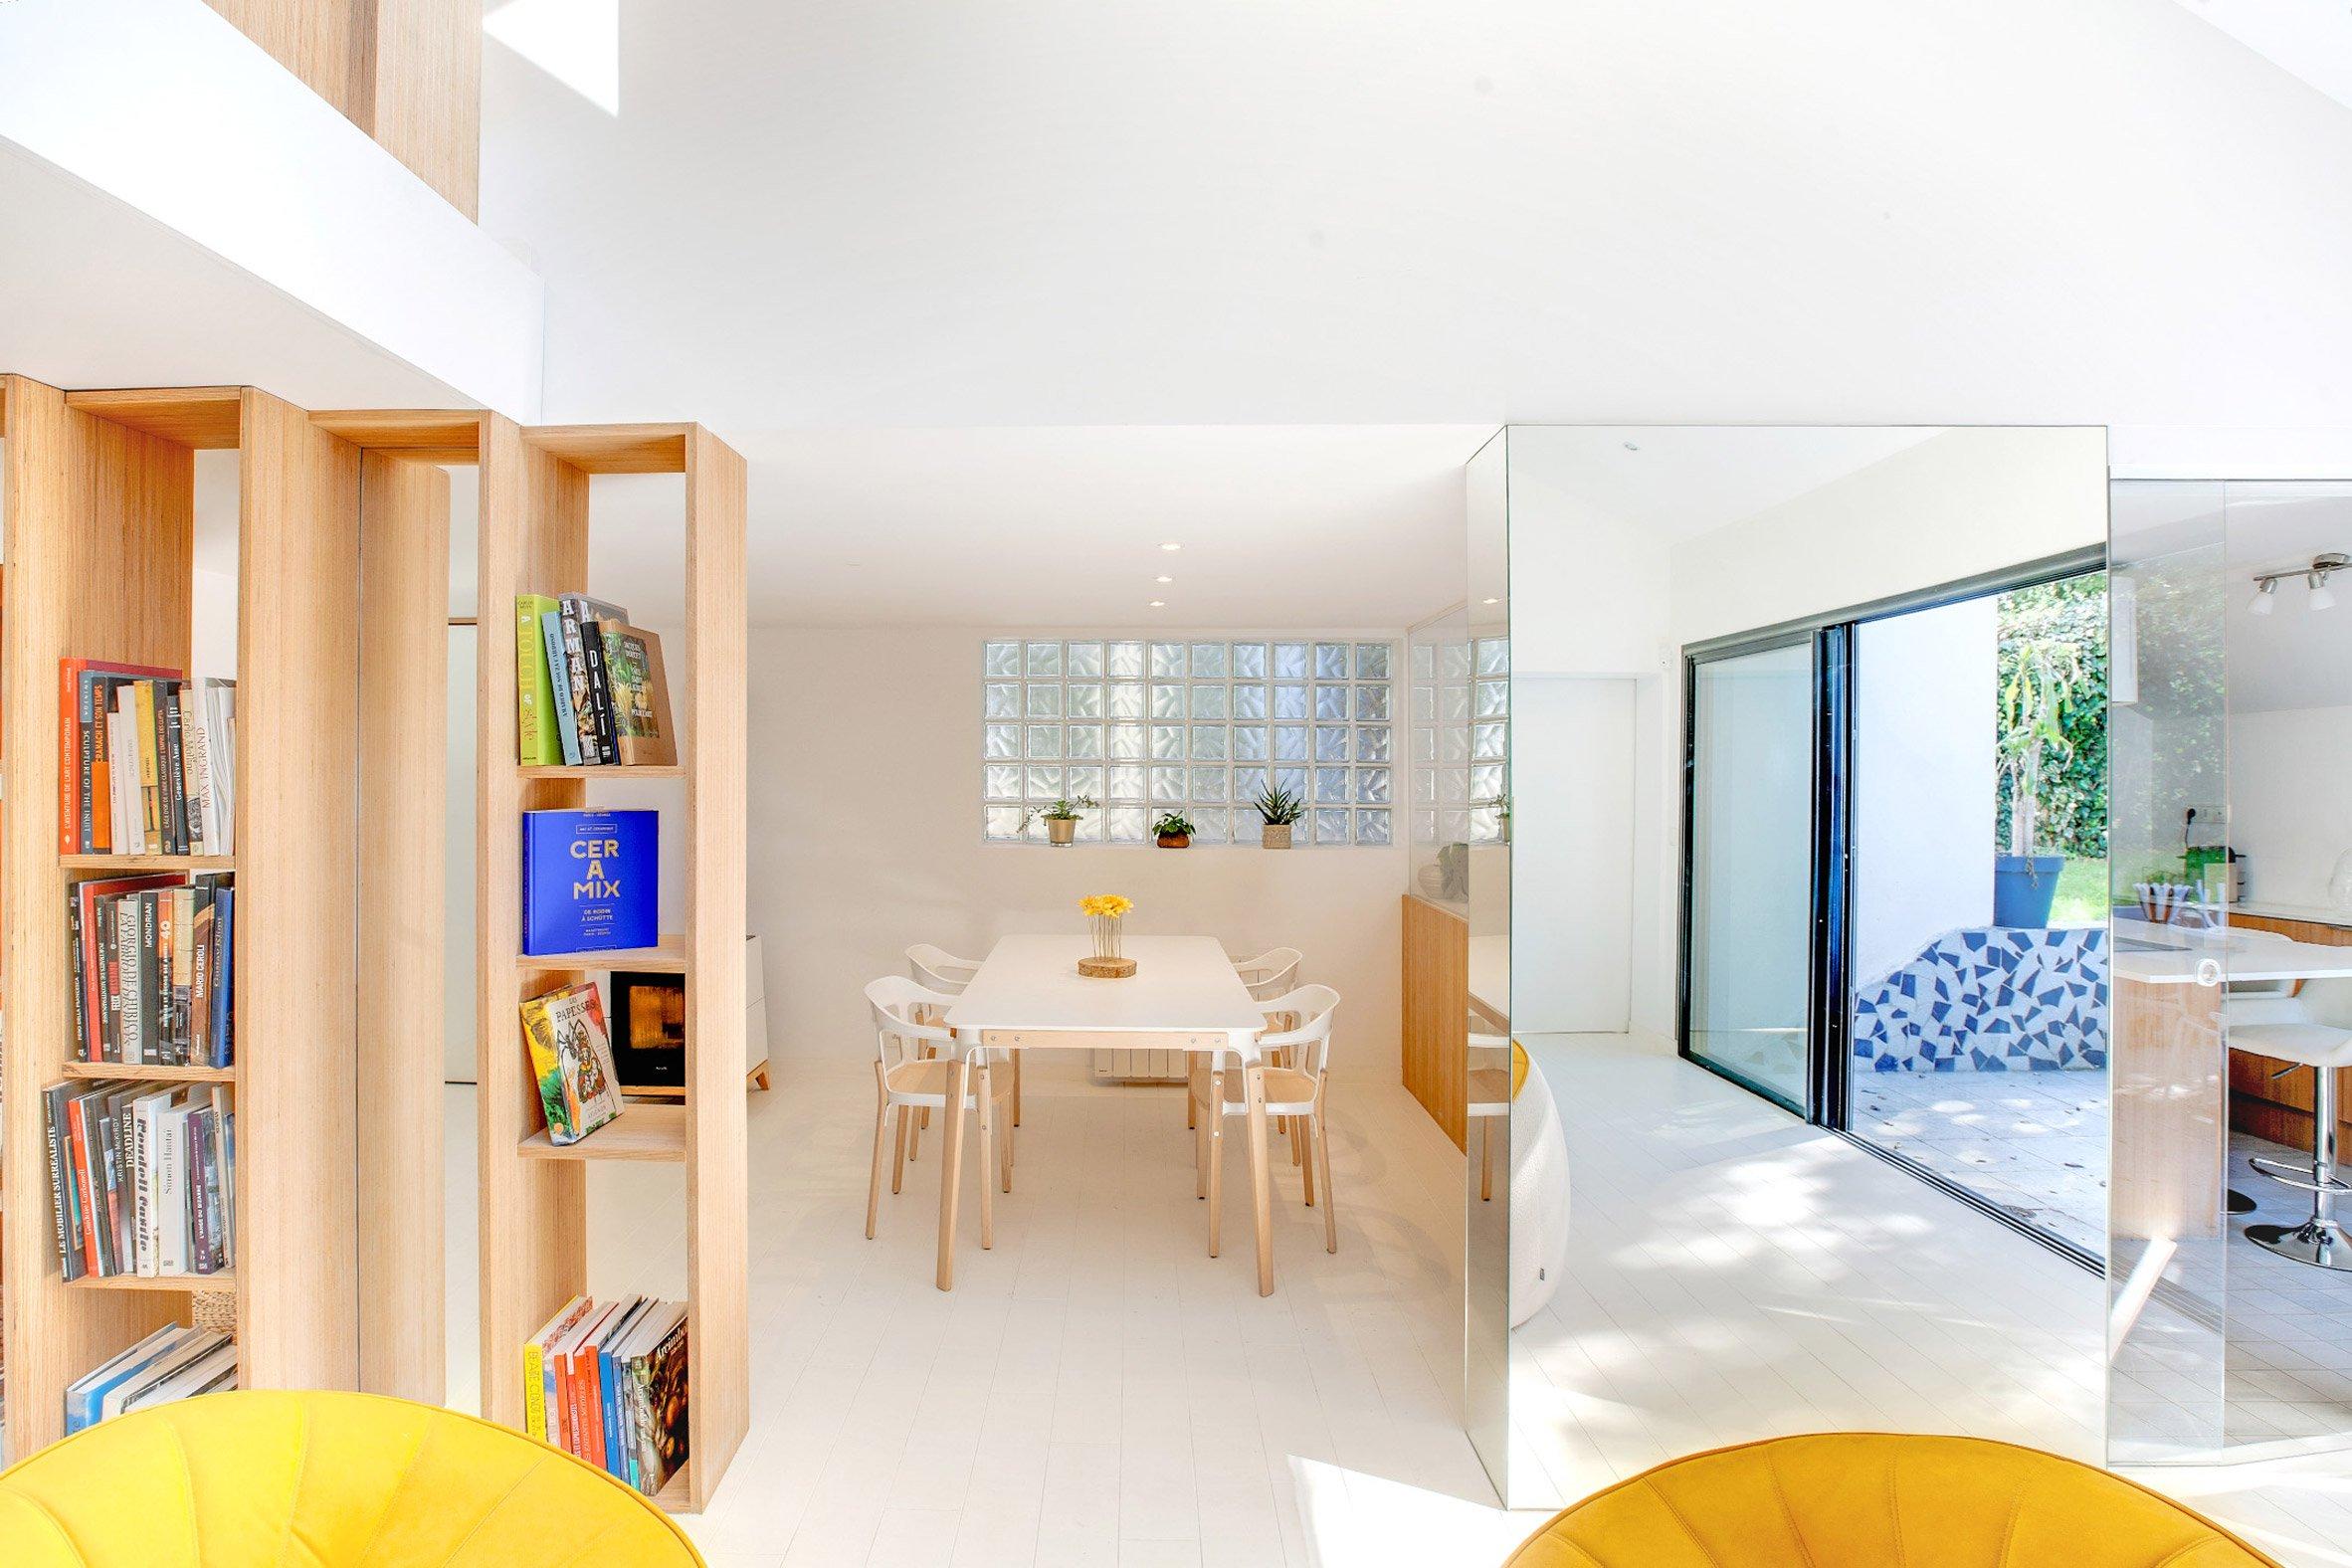 bookshelf-house-andrea-mosca-interior-paris-_dezeen_2364_col_8